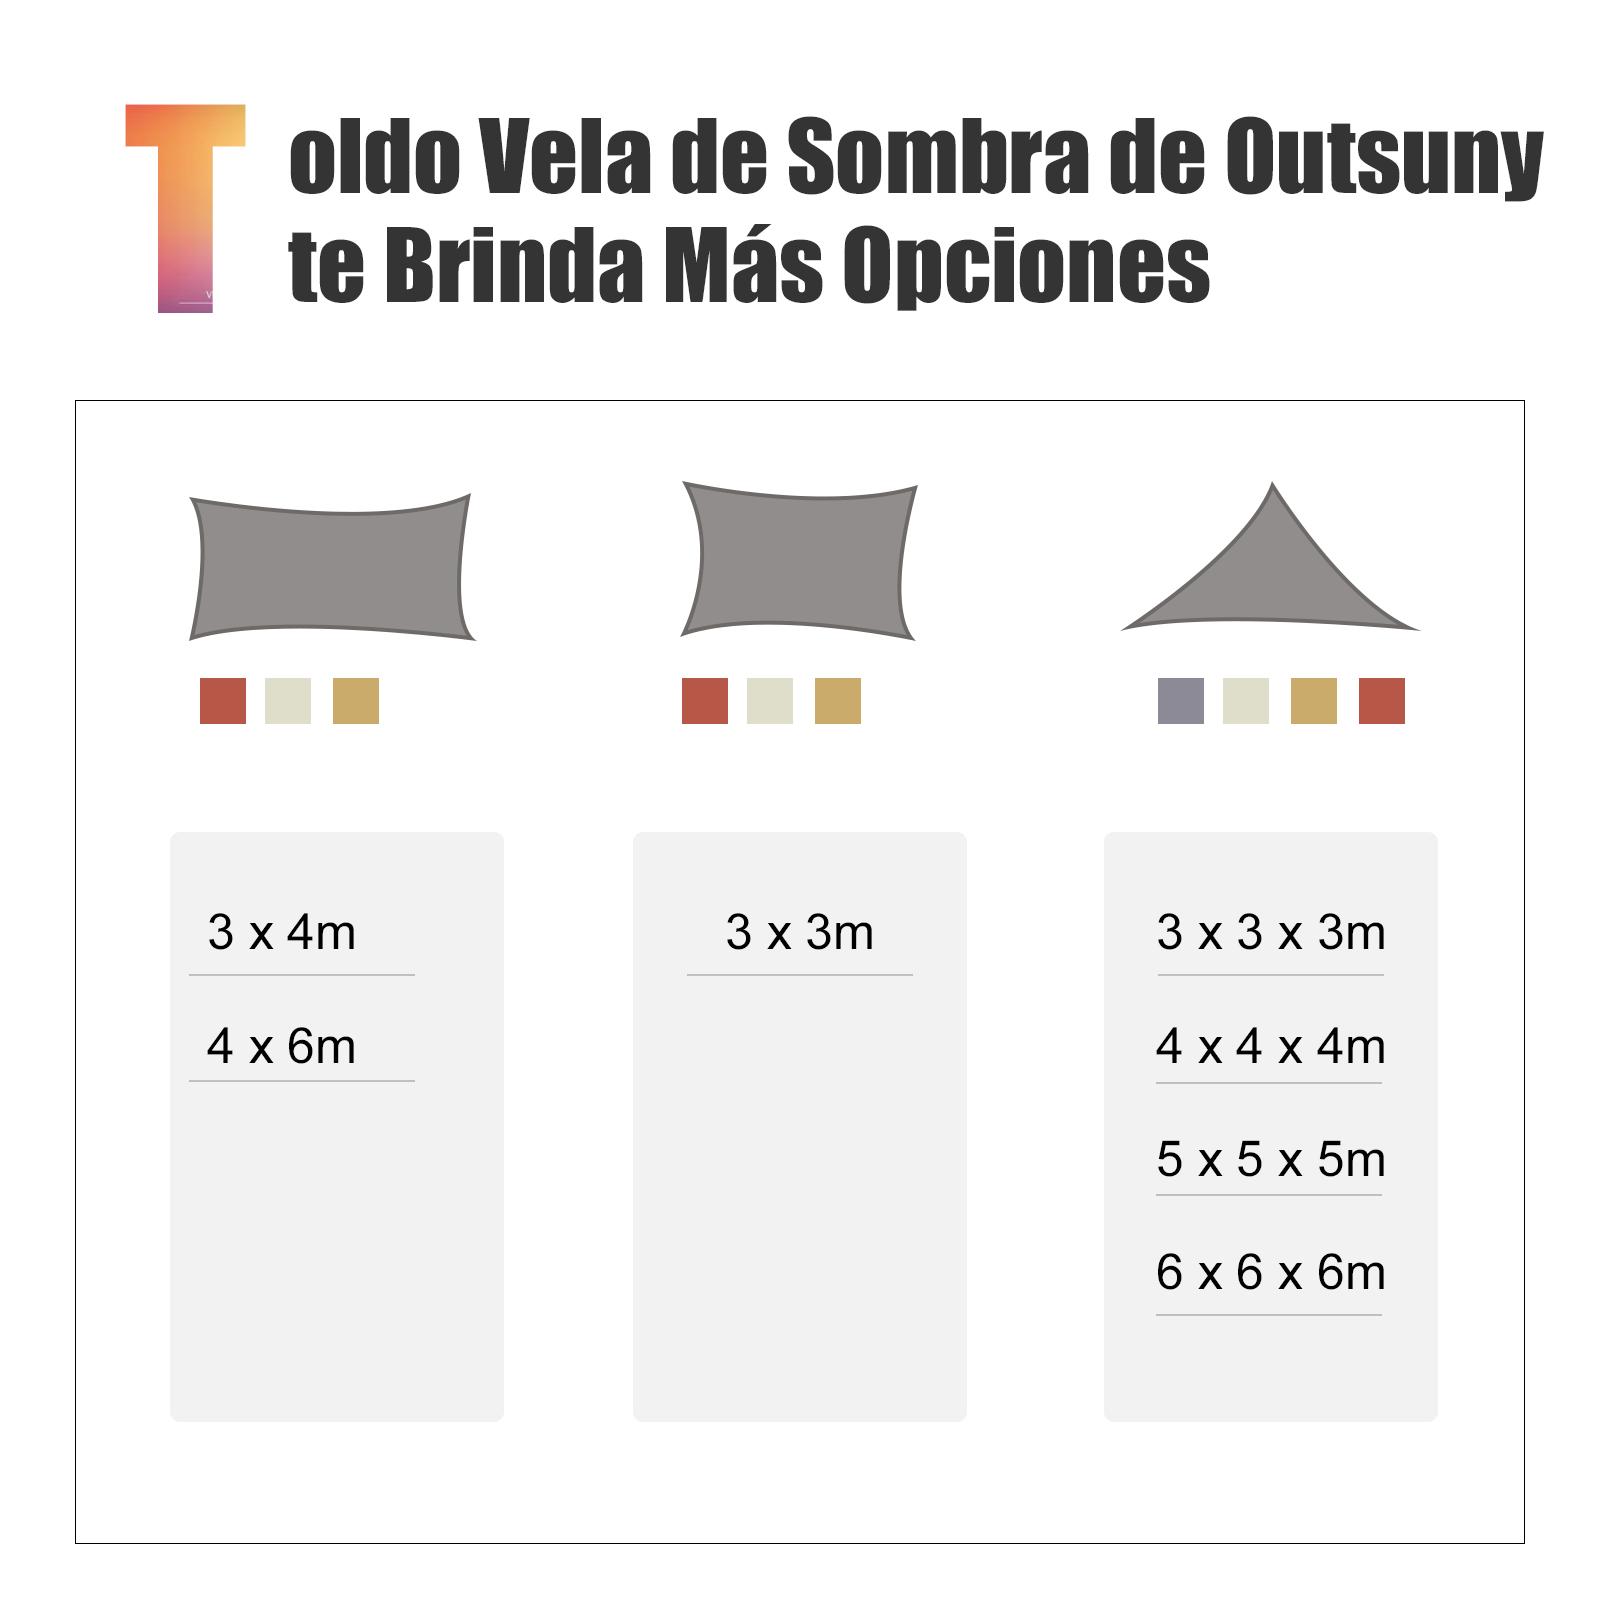 Toldo-Vela-Sombrilla-Parasol-Triangulo-Tejido-de-Poliester-160g-m2-Jardin-Playa miniatura 27